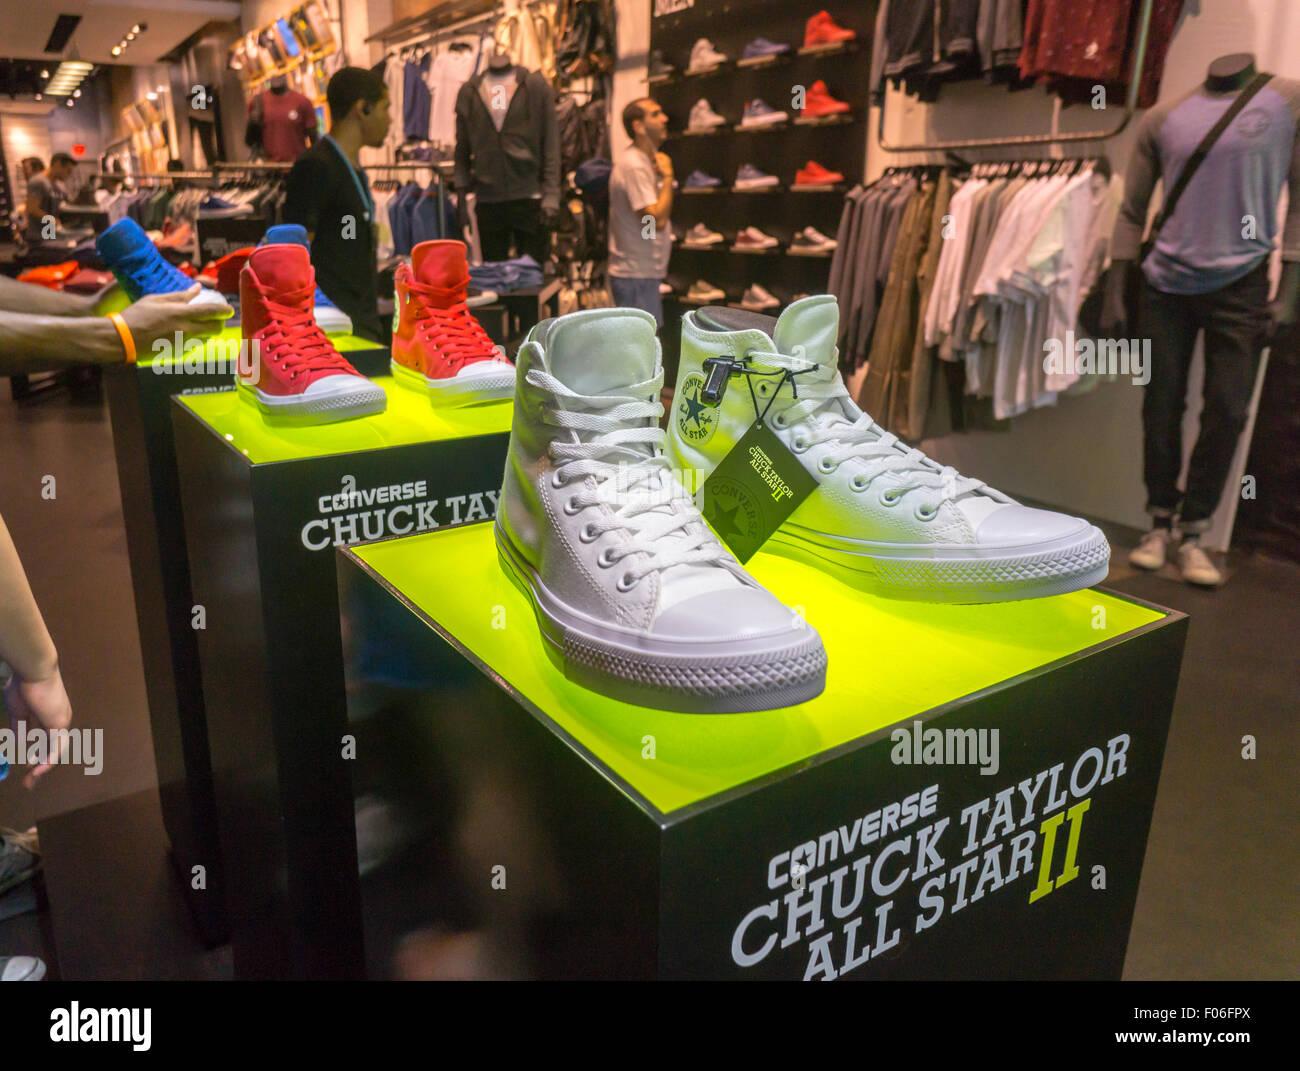 521de7ff1b3f64 The newly re-designed Chuck Taylor All Star II Converse sneaker in the Converse  store